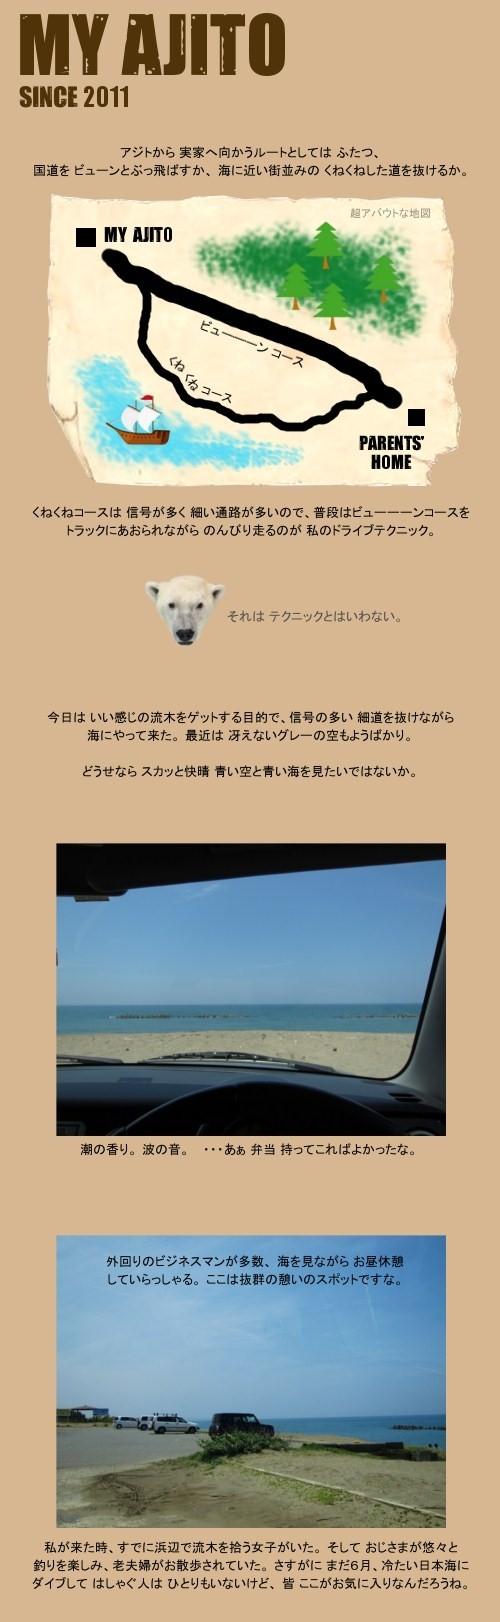 ryubo_1.jpg